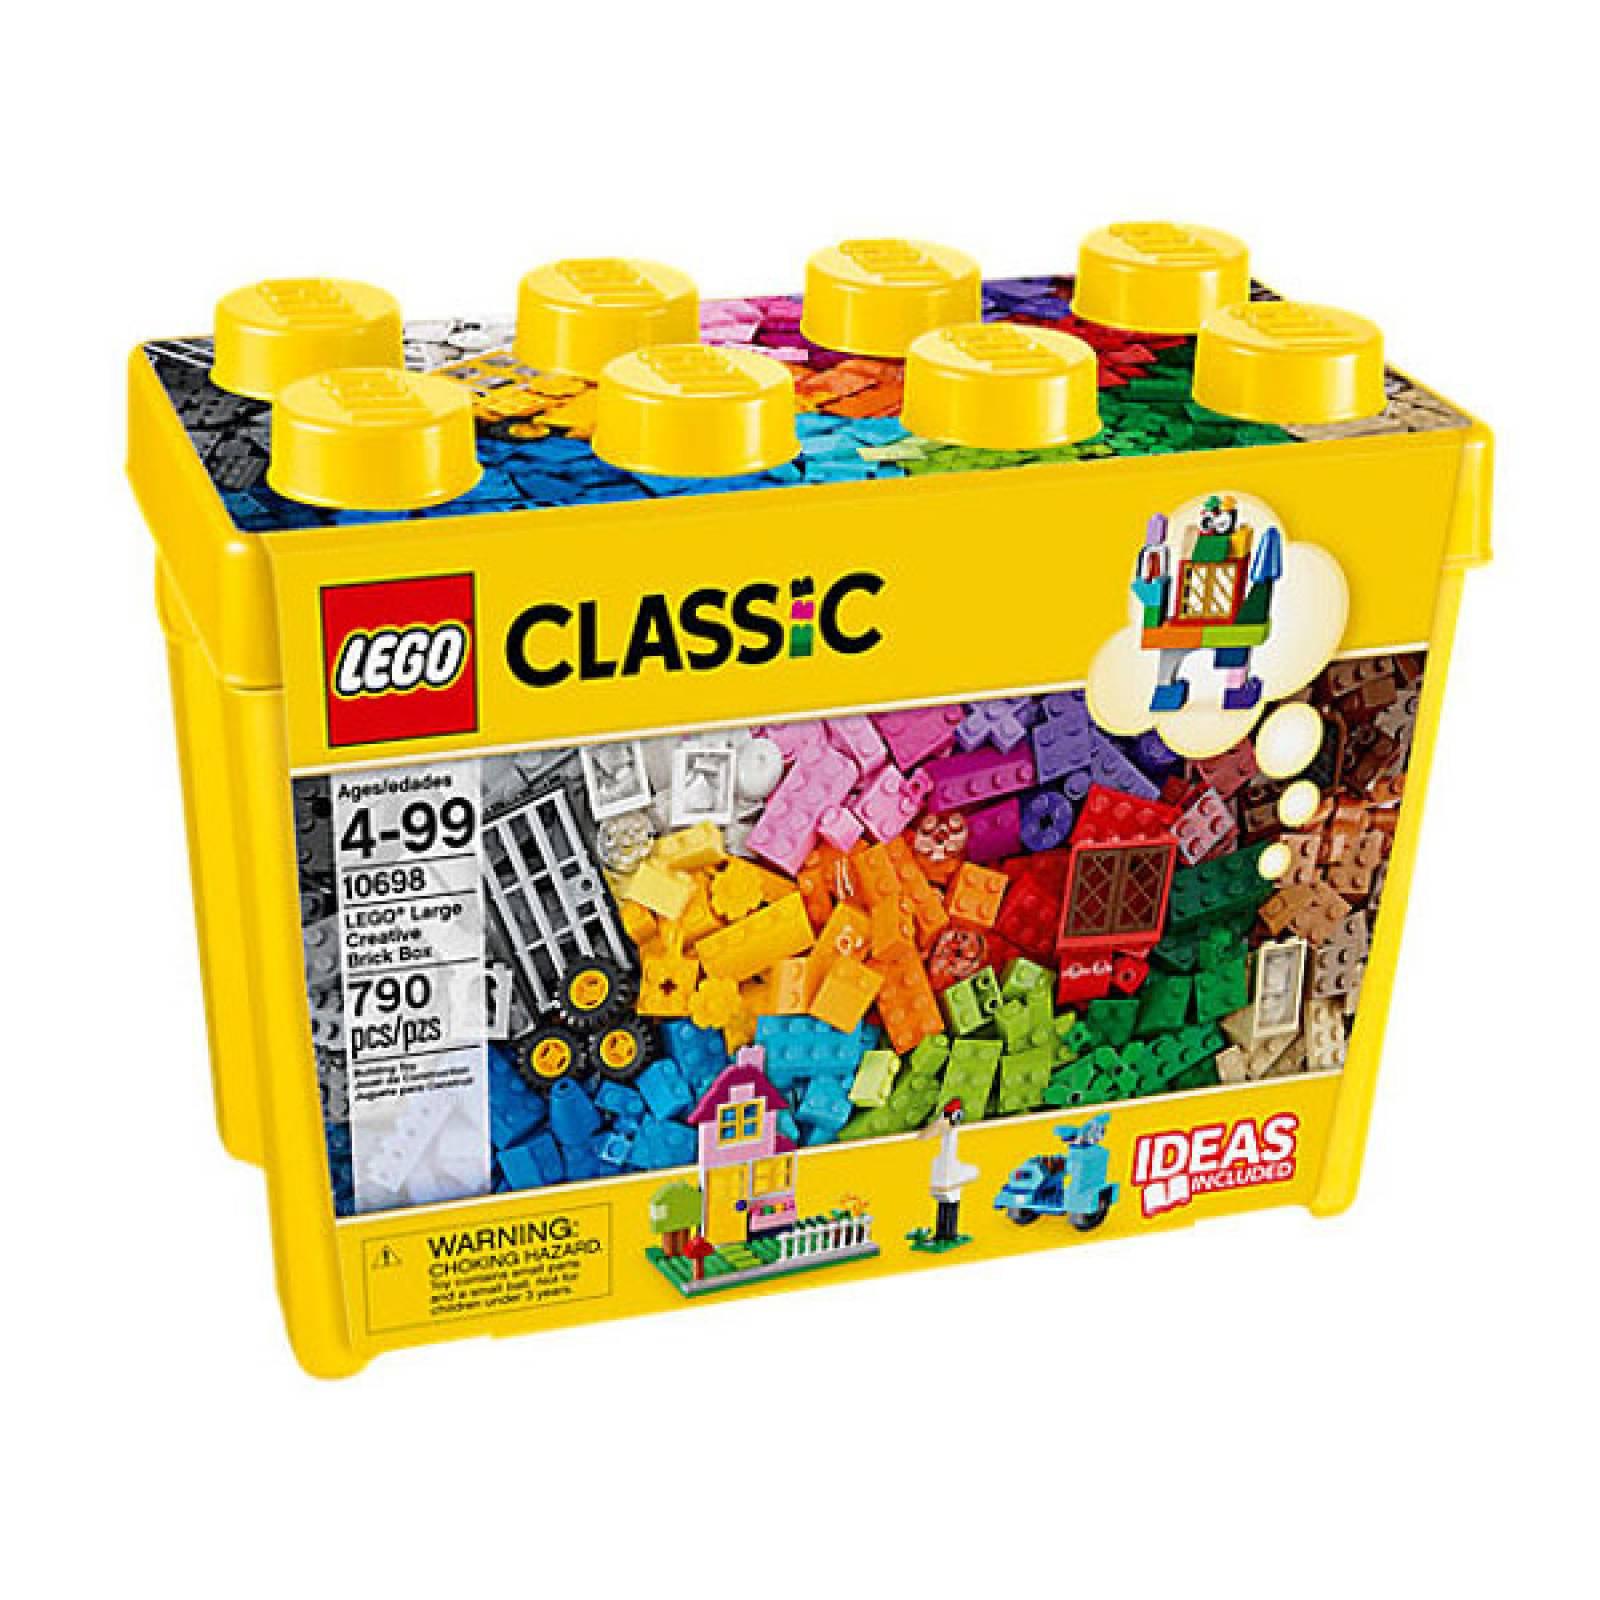 LEGO® Classic Large Creative Brick Box 4+ 10698 thumbnails